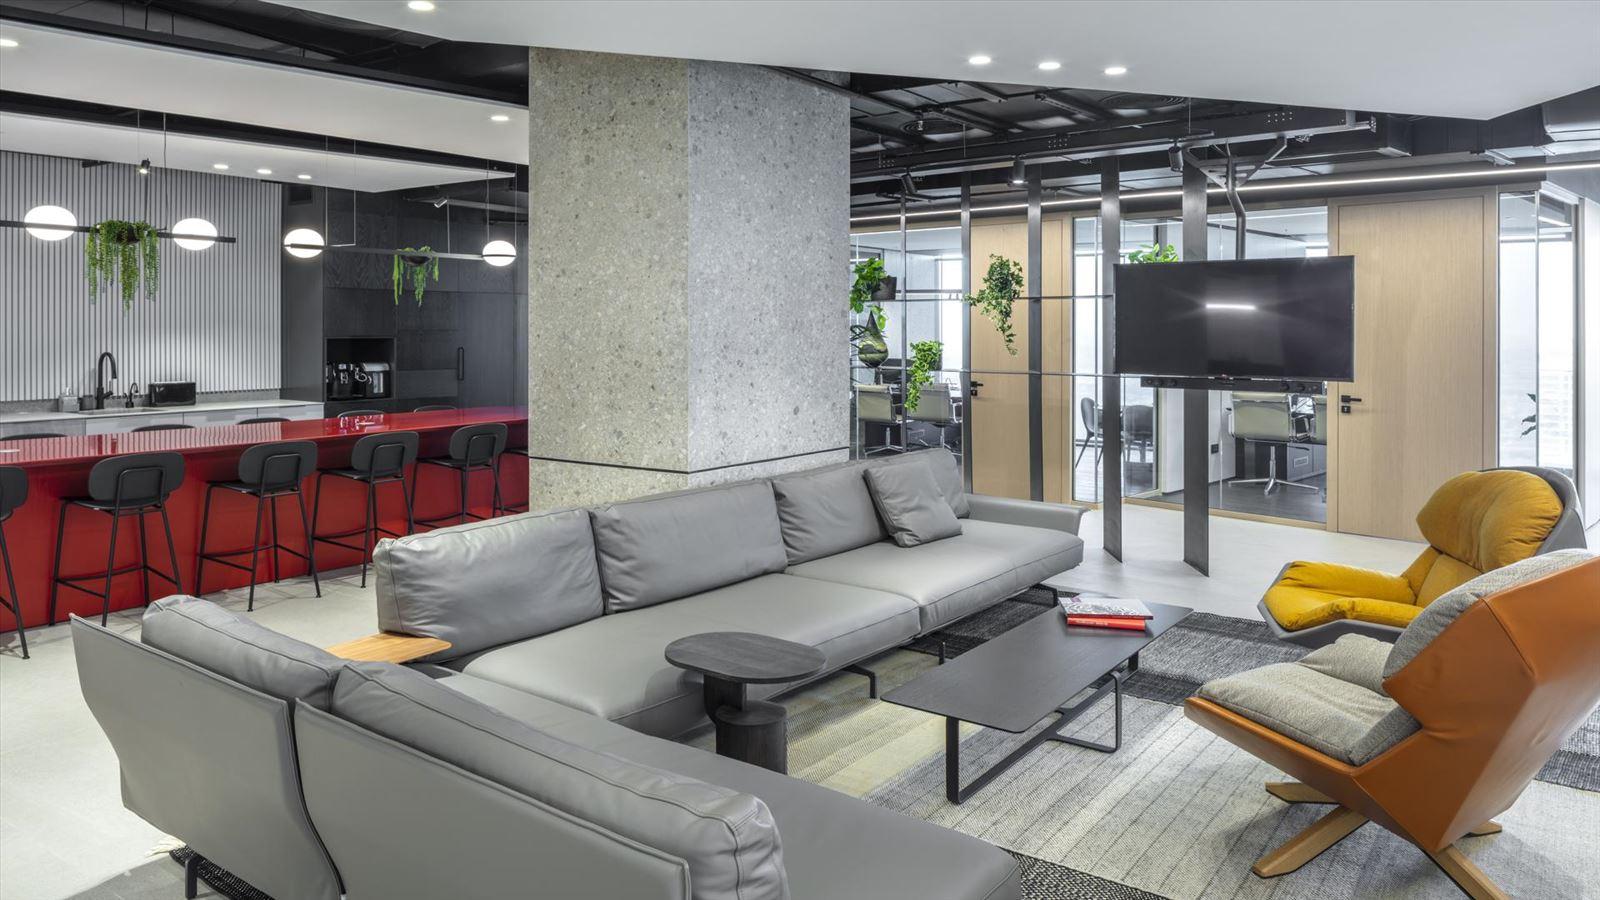 Fortissimo Offices – Tel Aviv פינת הישיבה עם עיצוב מיוחד של גופי תאורה בתכנון דורי קמחי